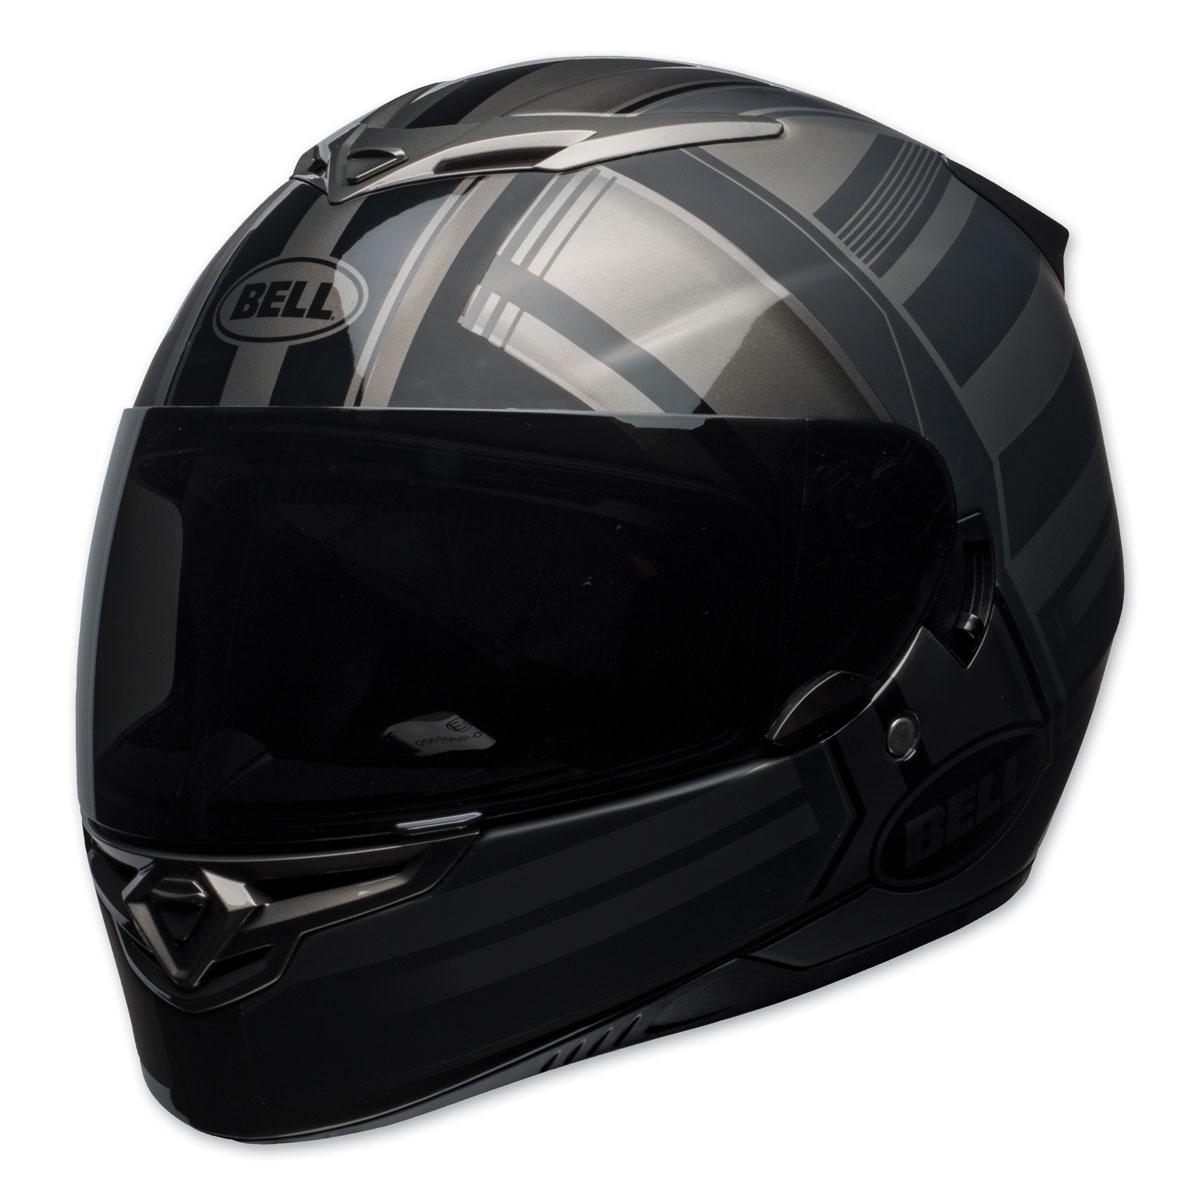 Bell RS-2 Tactical Black/Titanium Full Face Helmet